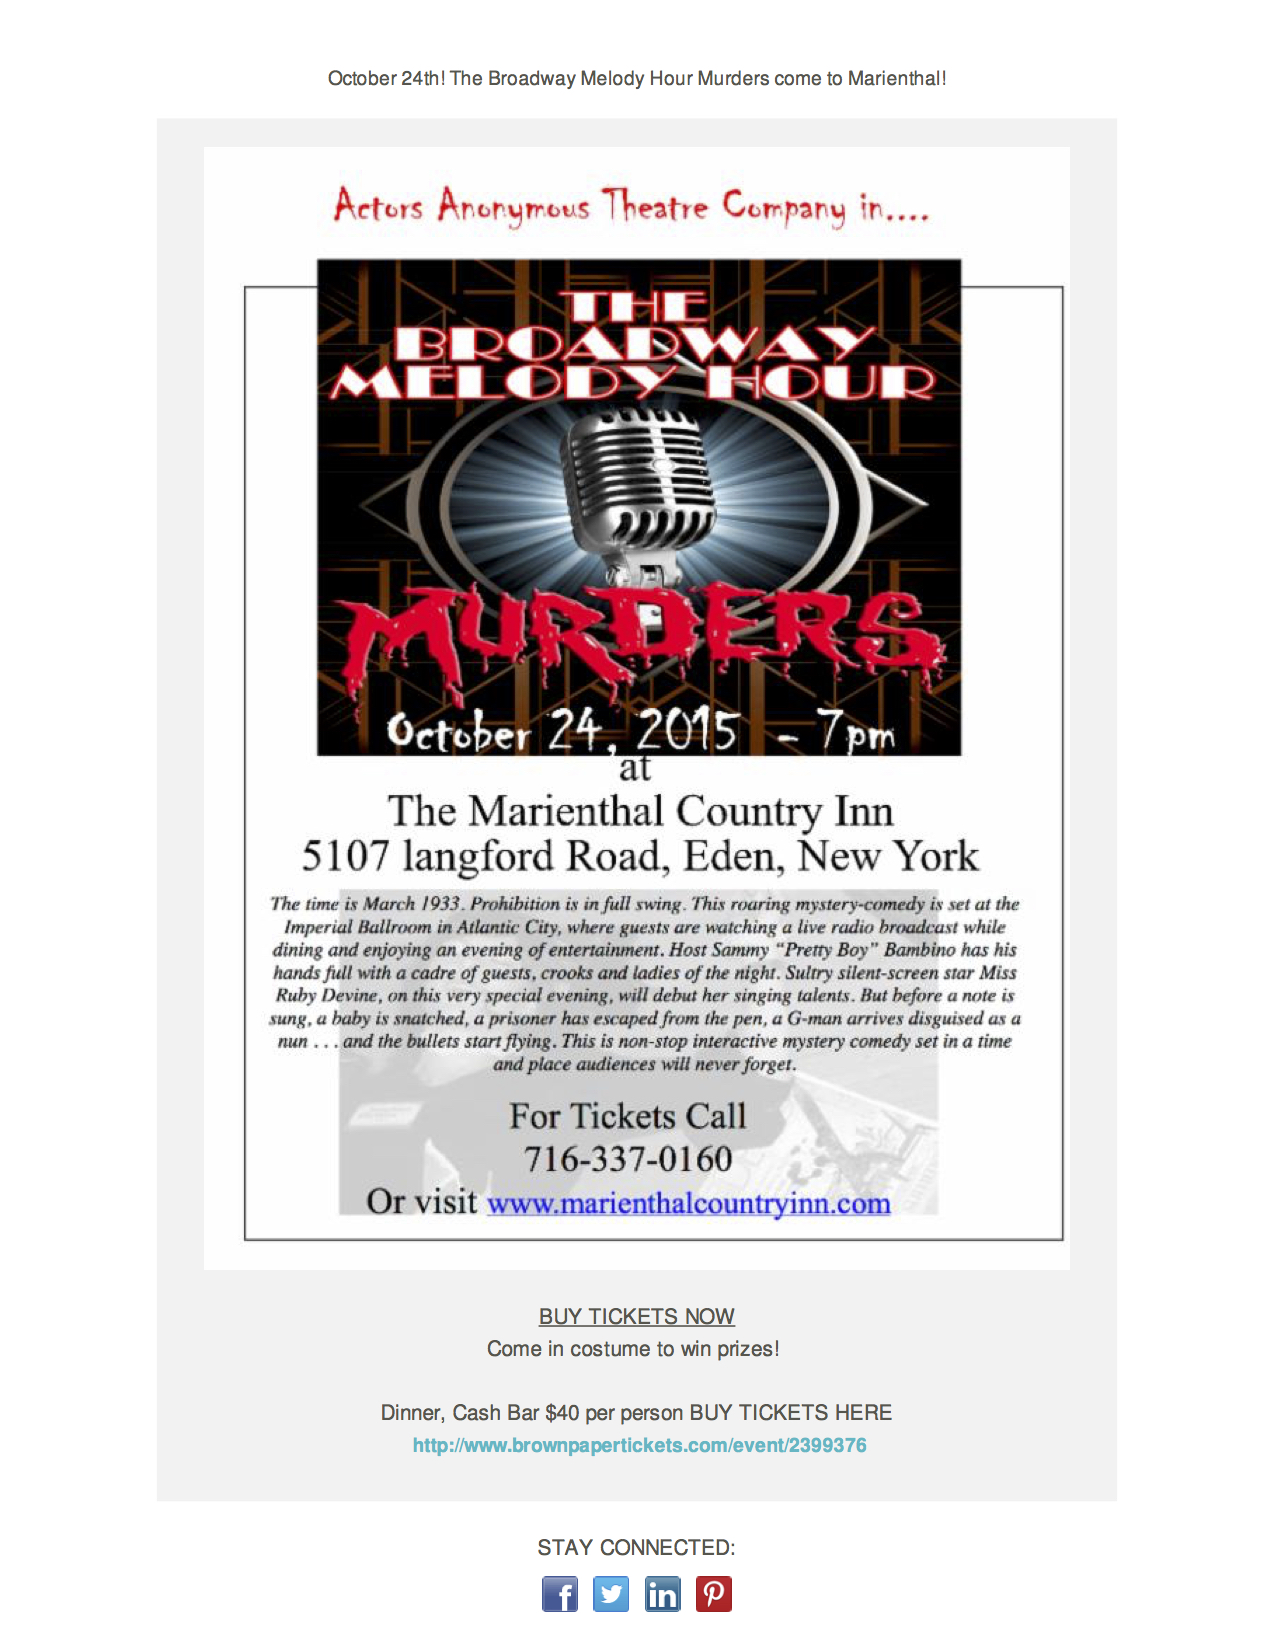 Broadway Murder CC email